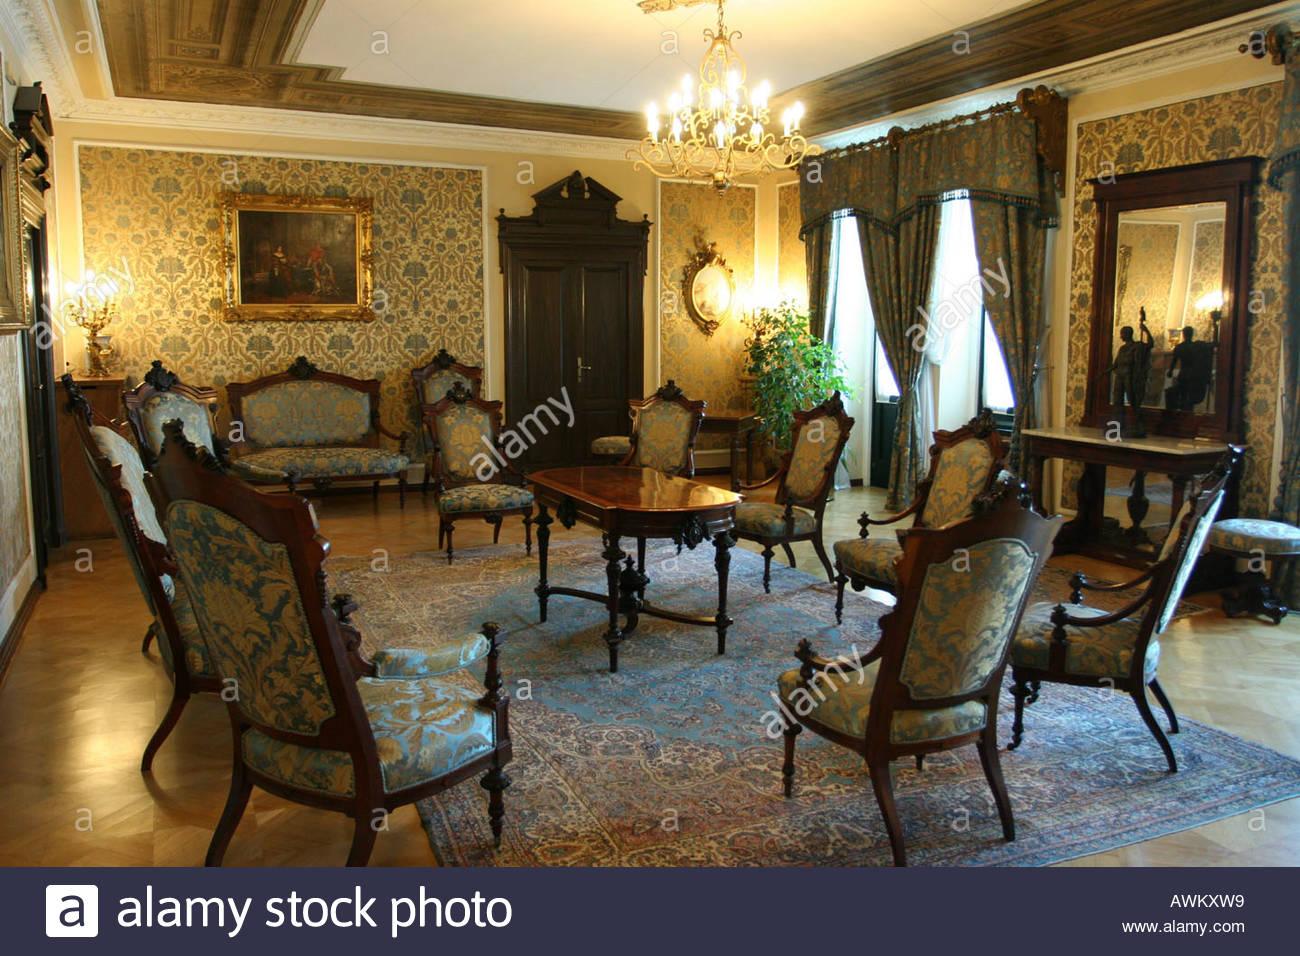 Antike Einrichtung antiquity furniture - Antike Einrichtung Antiquity Furniture Stock Photo, Royalty Free